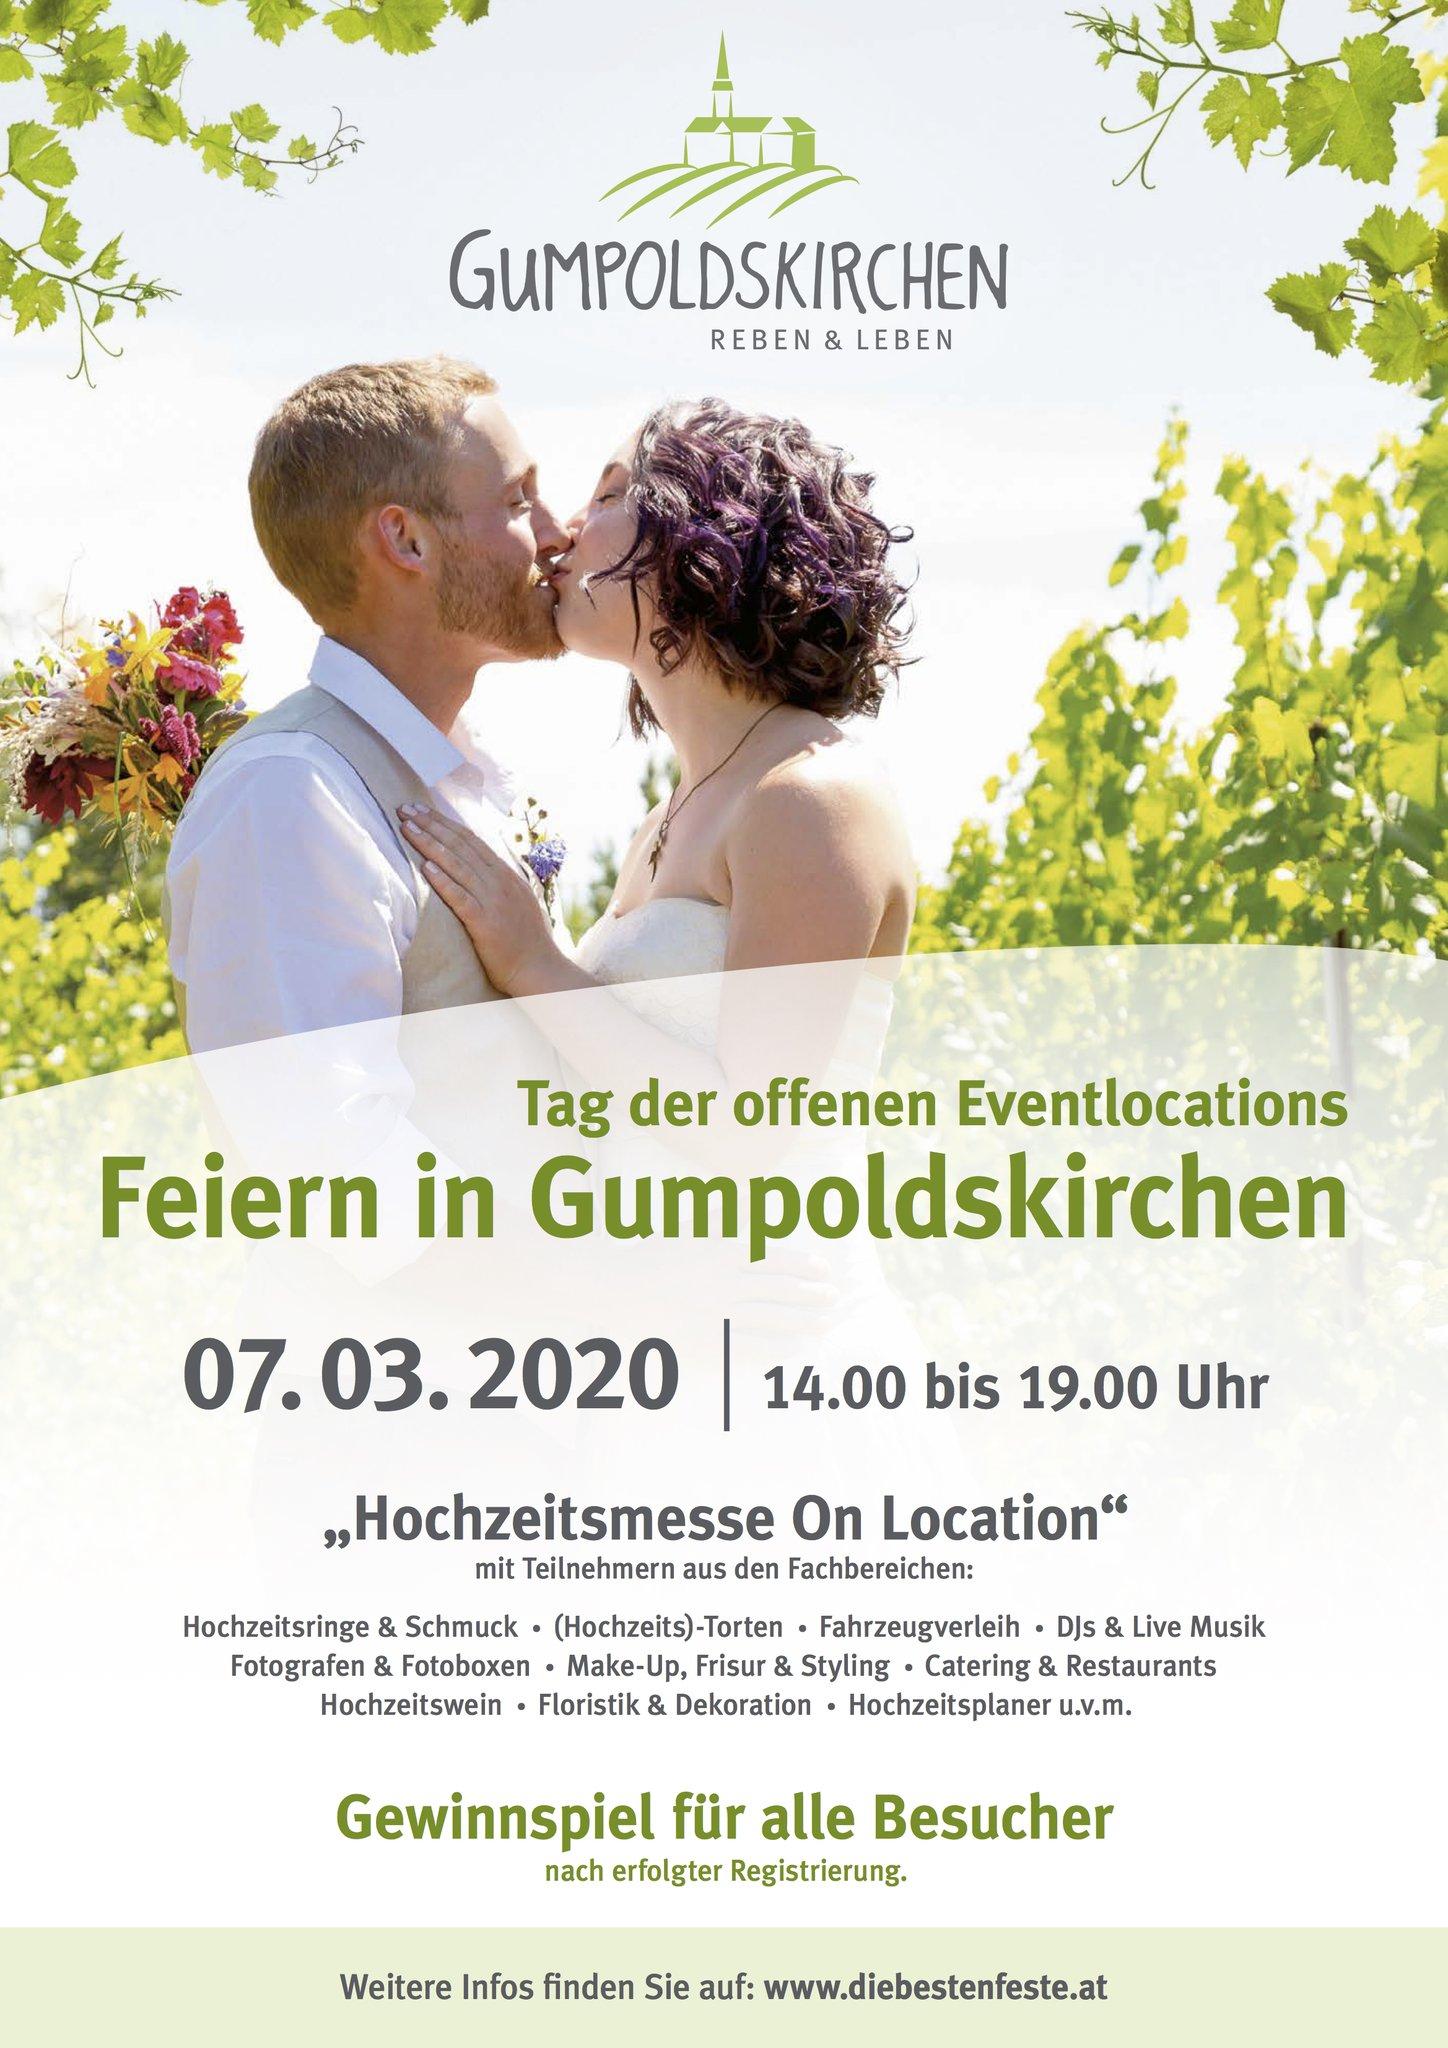 Frau sucht Mann Gumpoldskirchen | Locanto Casual Dating